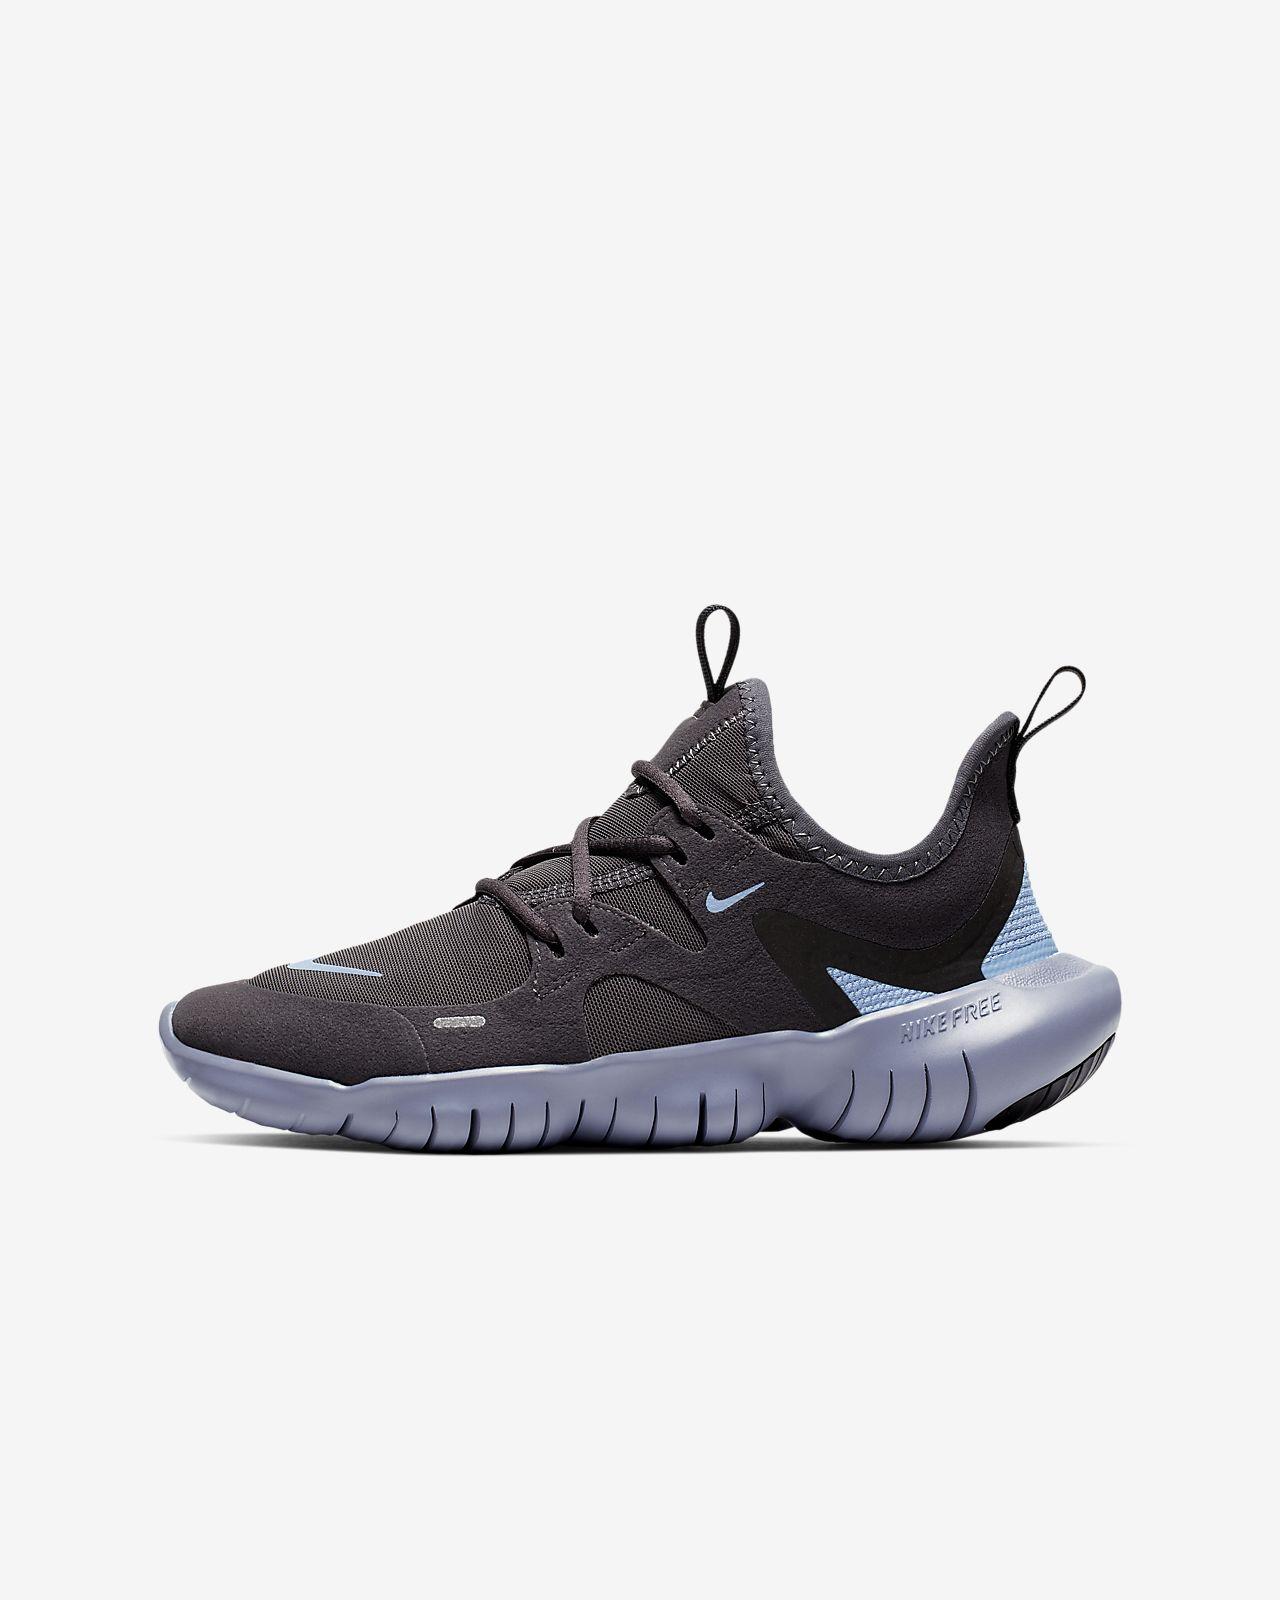 Sapatilhas de running Nike Free RN 5.0 Júnior